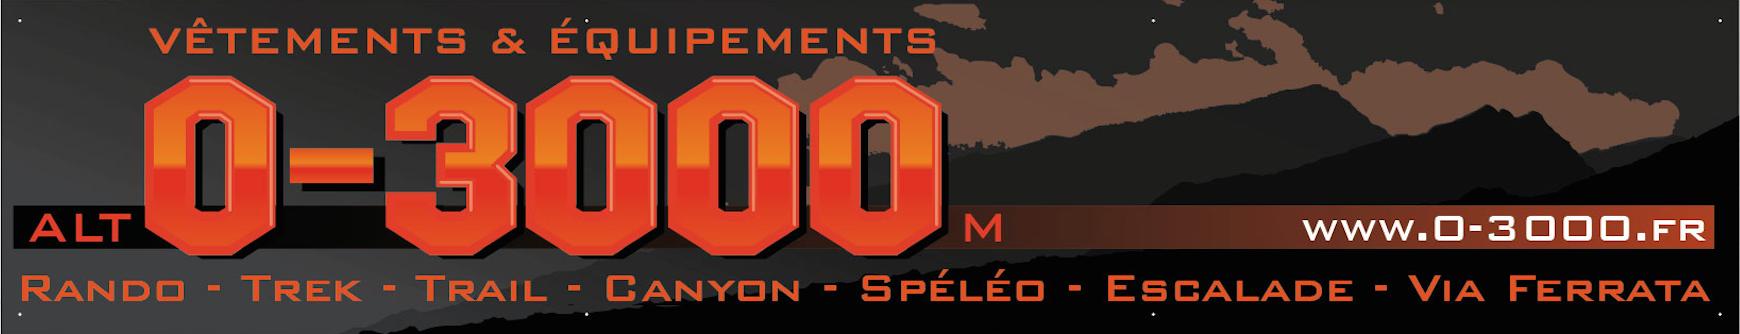 0-3000